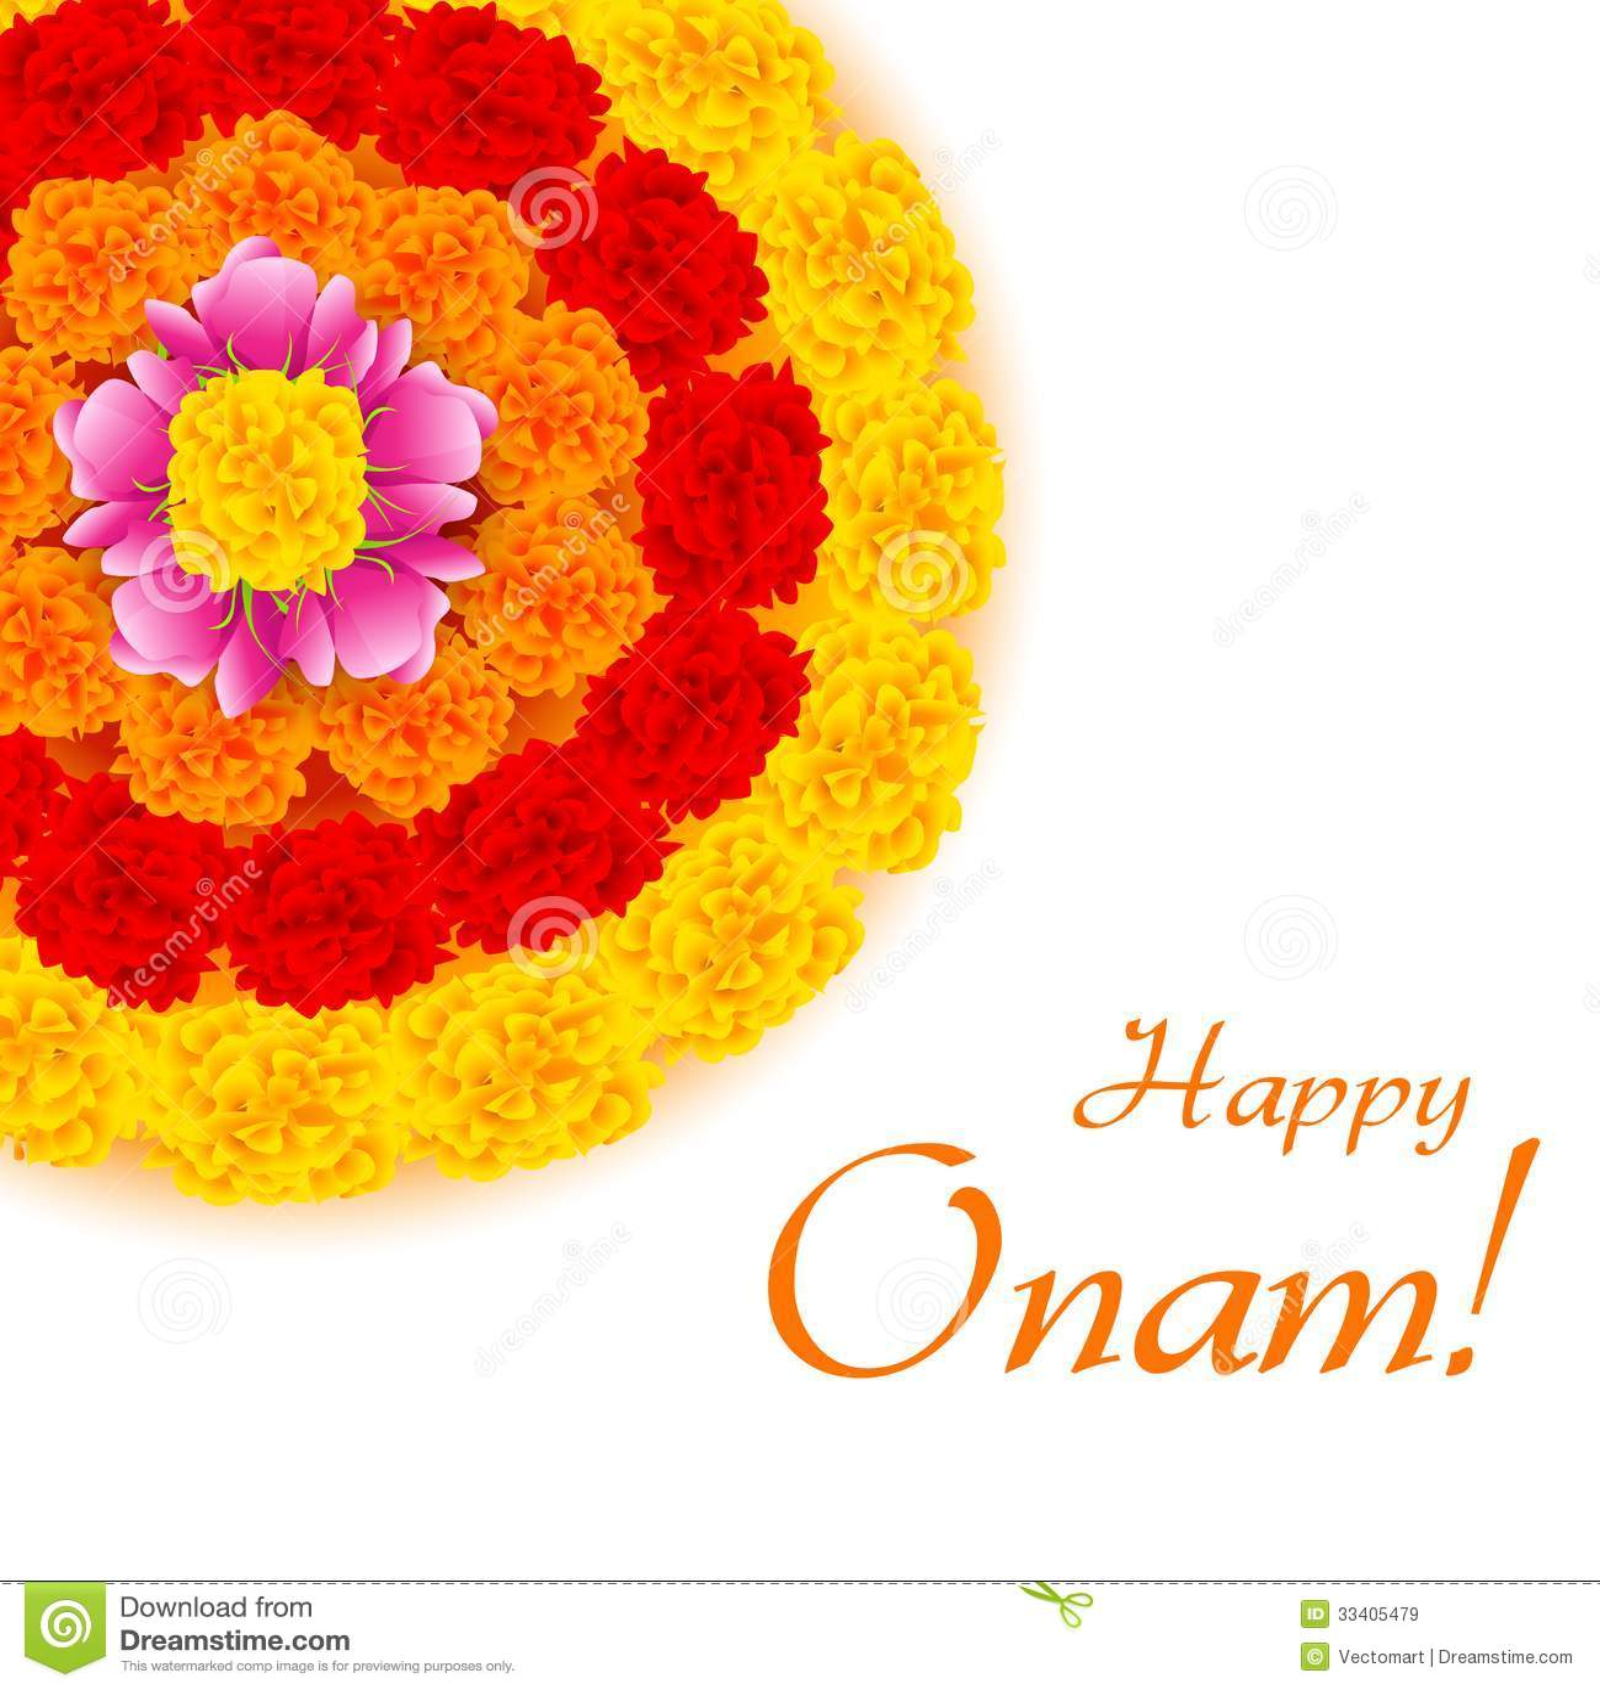 Flower rangoli for onam stock vector illustration of occasion flower rangoli for onam occasion invitation kristyandbryce Image collections